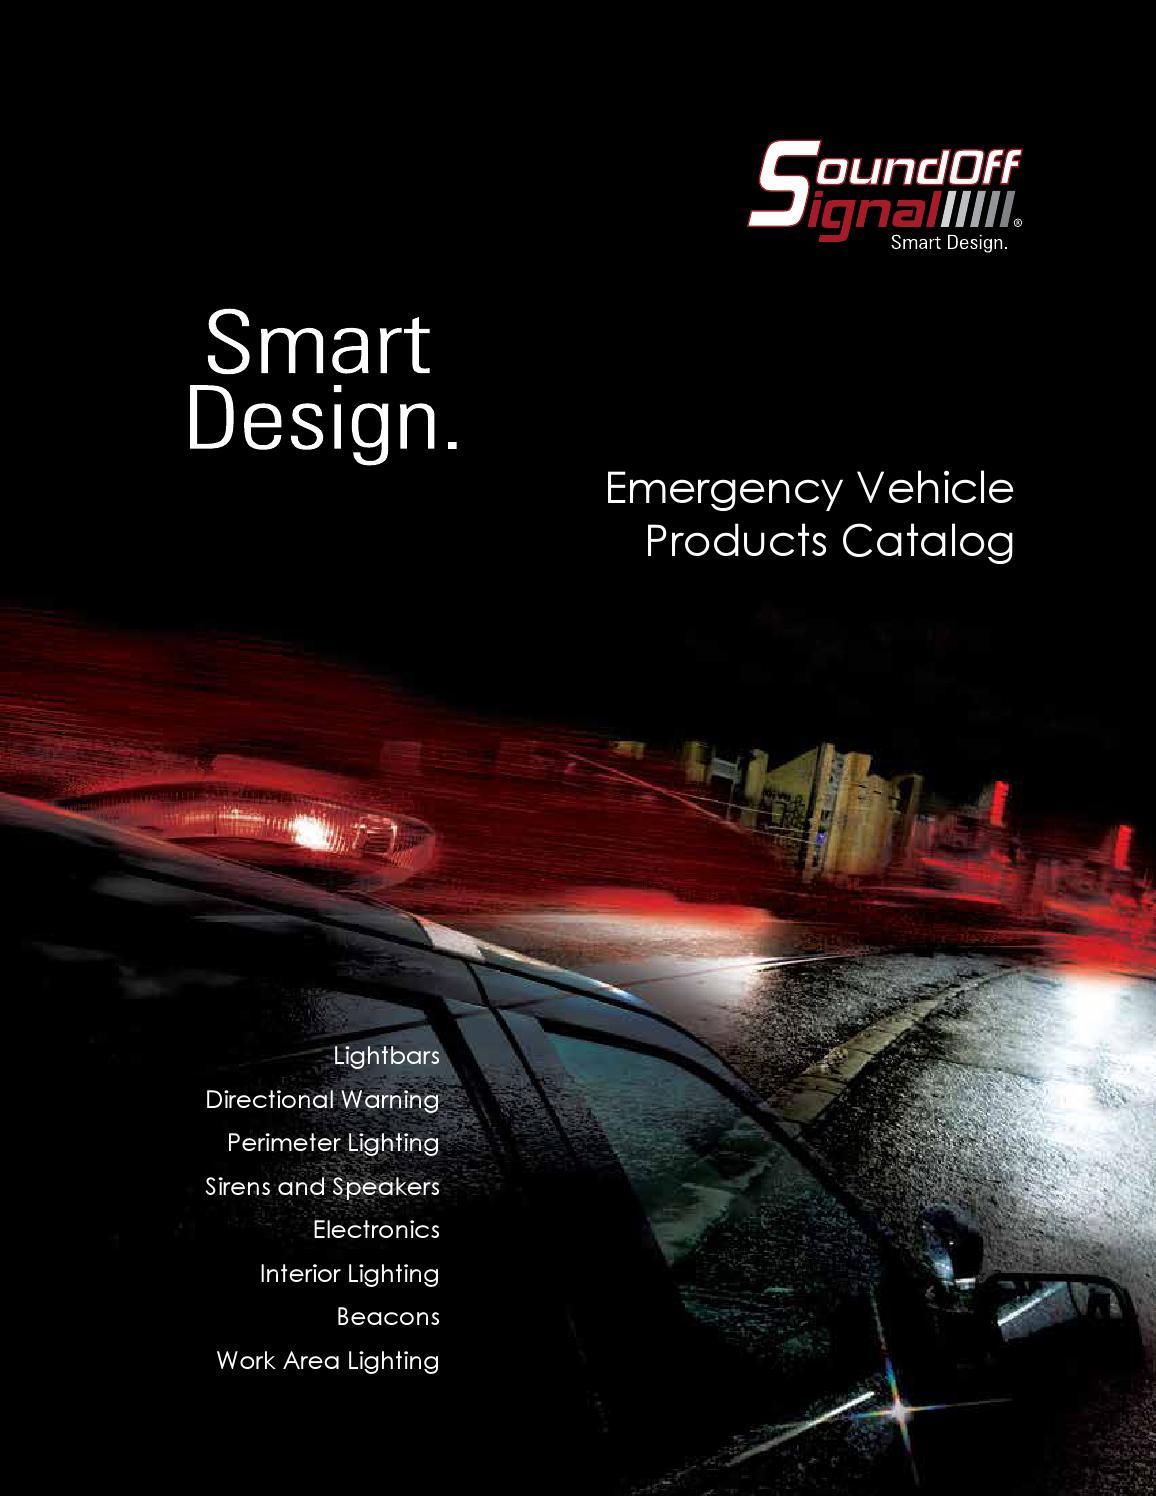 soundoff signal catalog by lee winter issuuSoundoff Signal Wiring Diagram #19